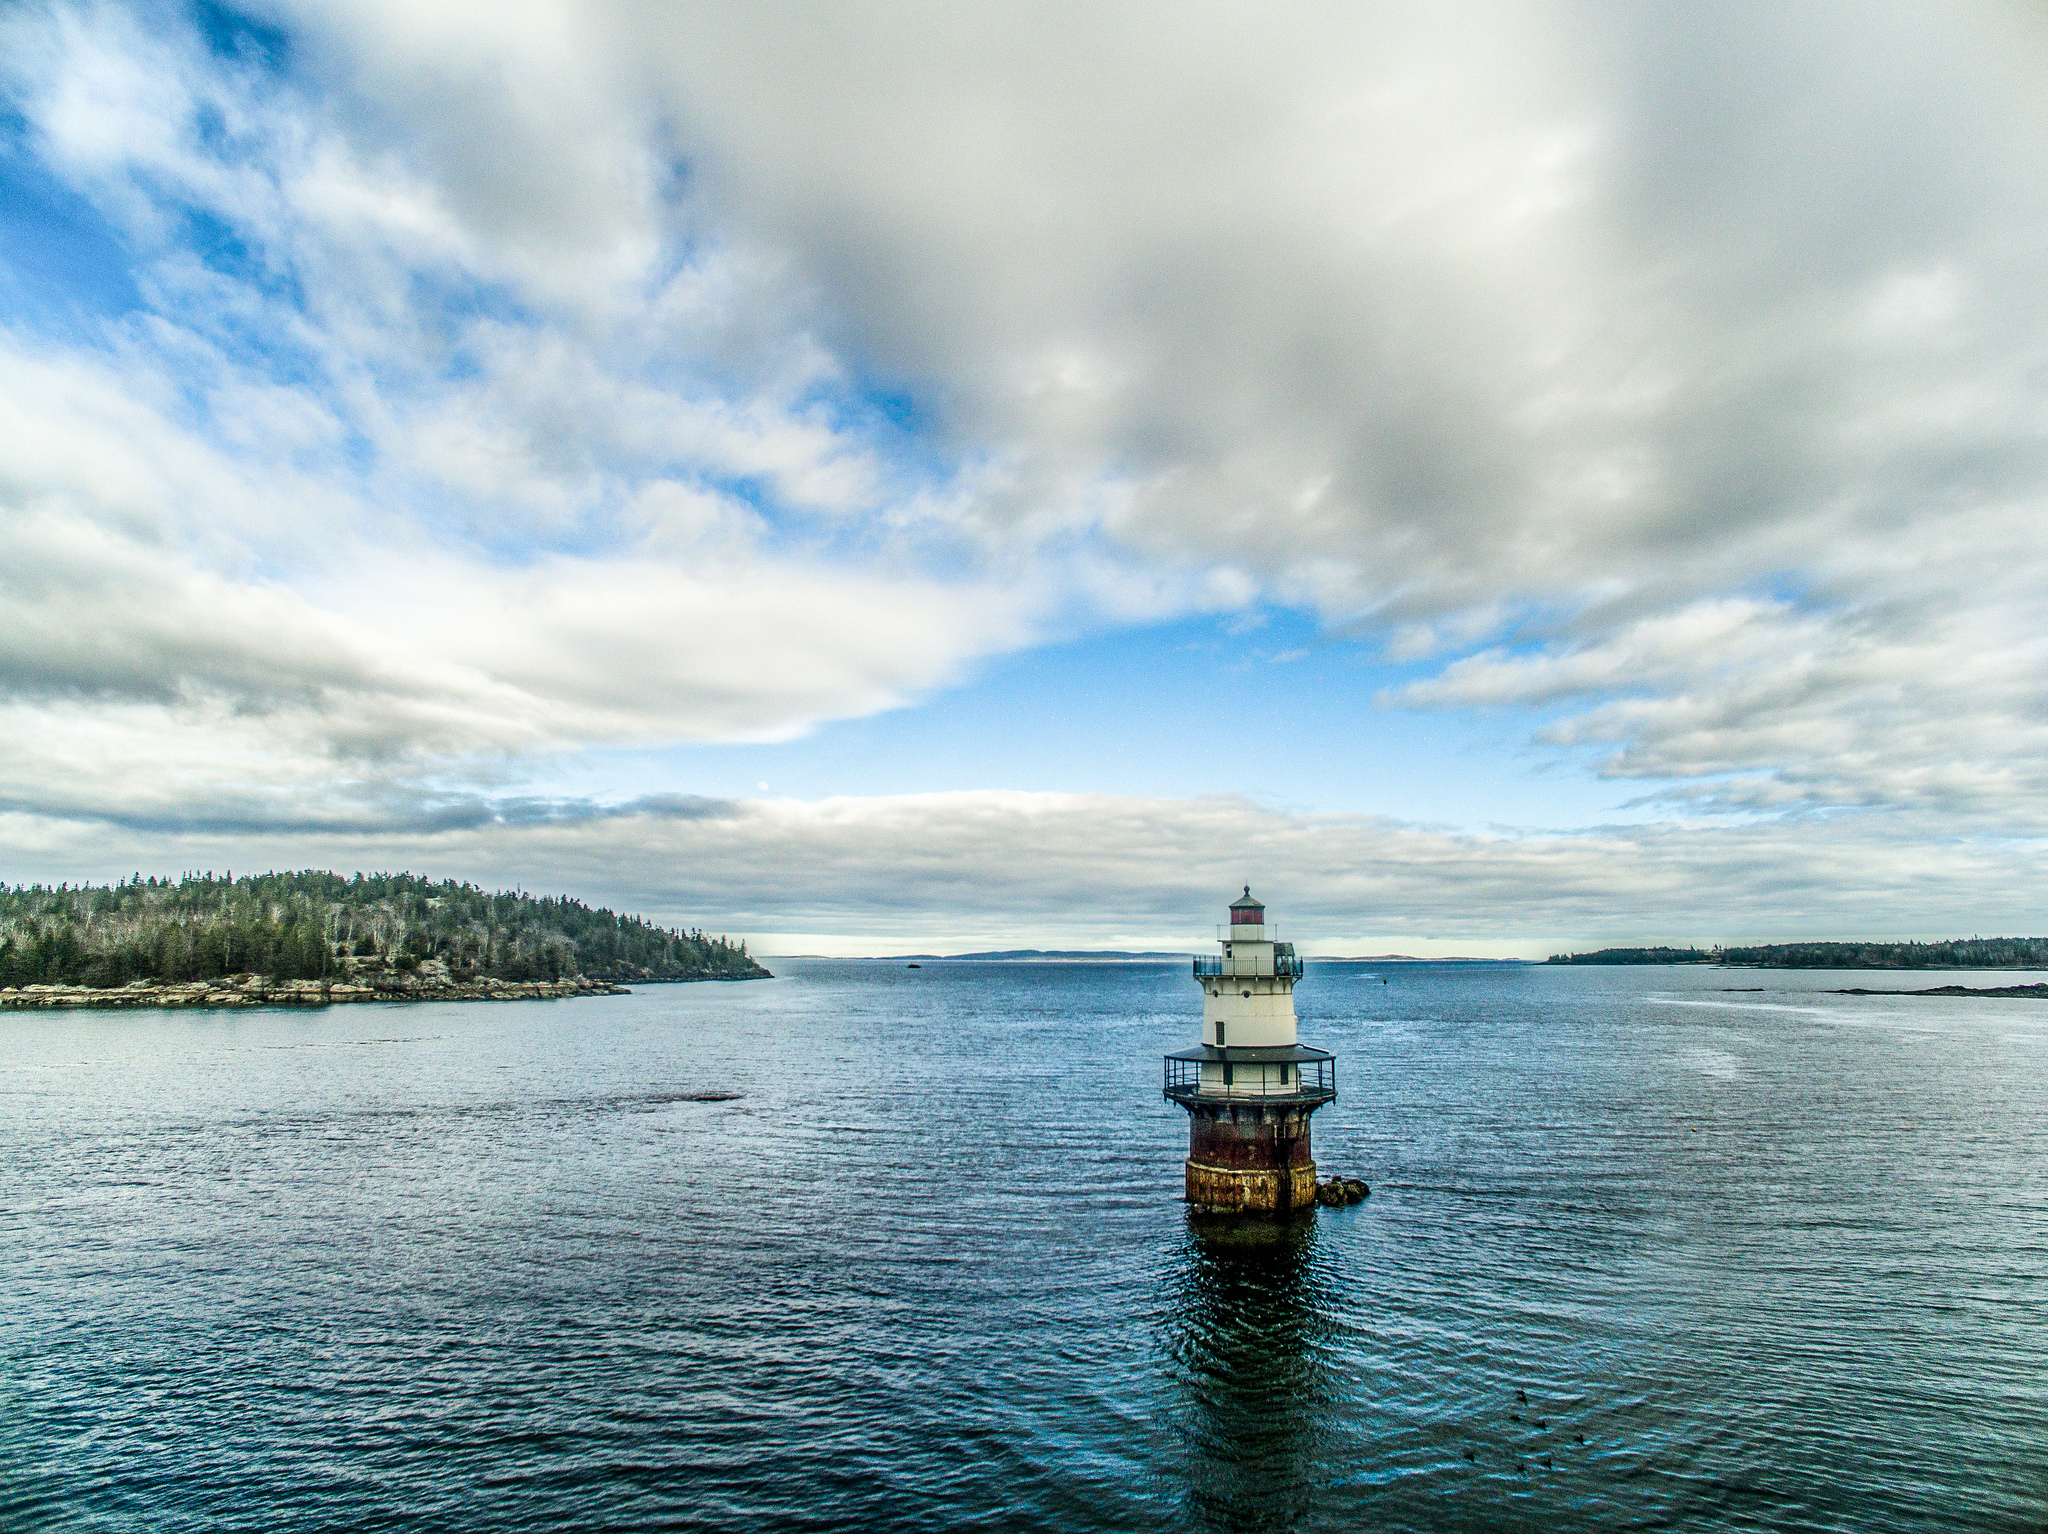 Goose Rocks Lighthouse, 2015 – Photo by Bill Trevaskis